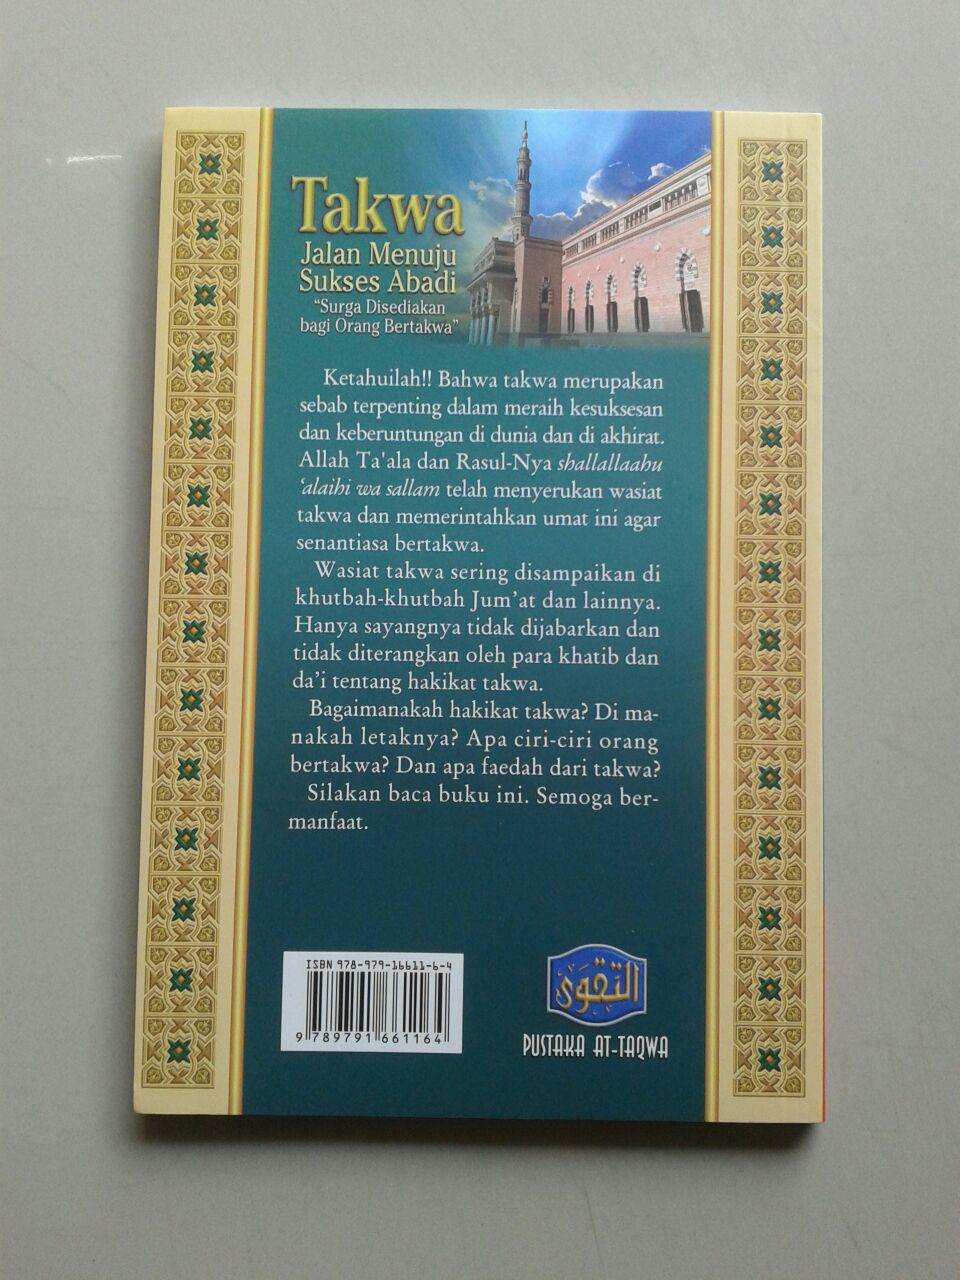 Buku Takwa Jalan Sukses Abadi cover